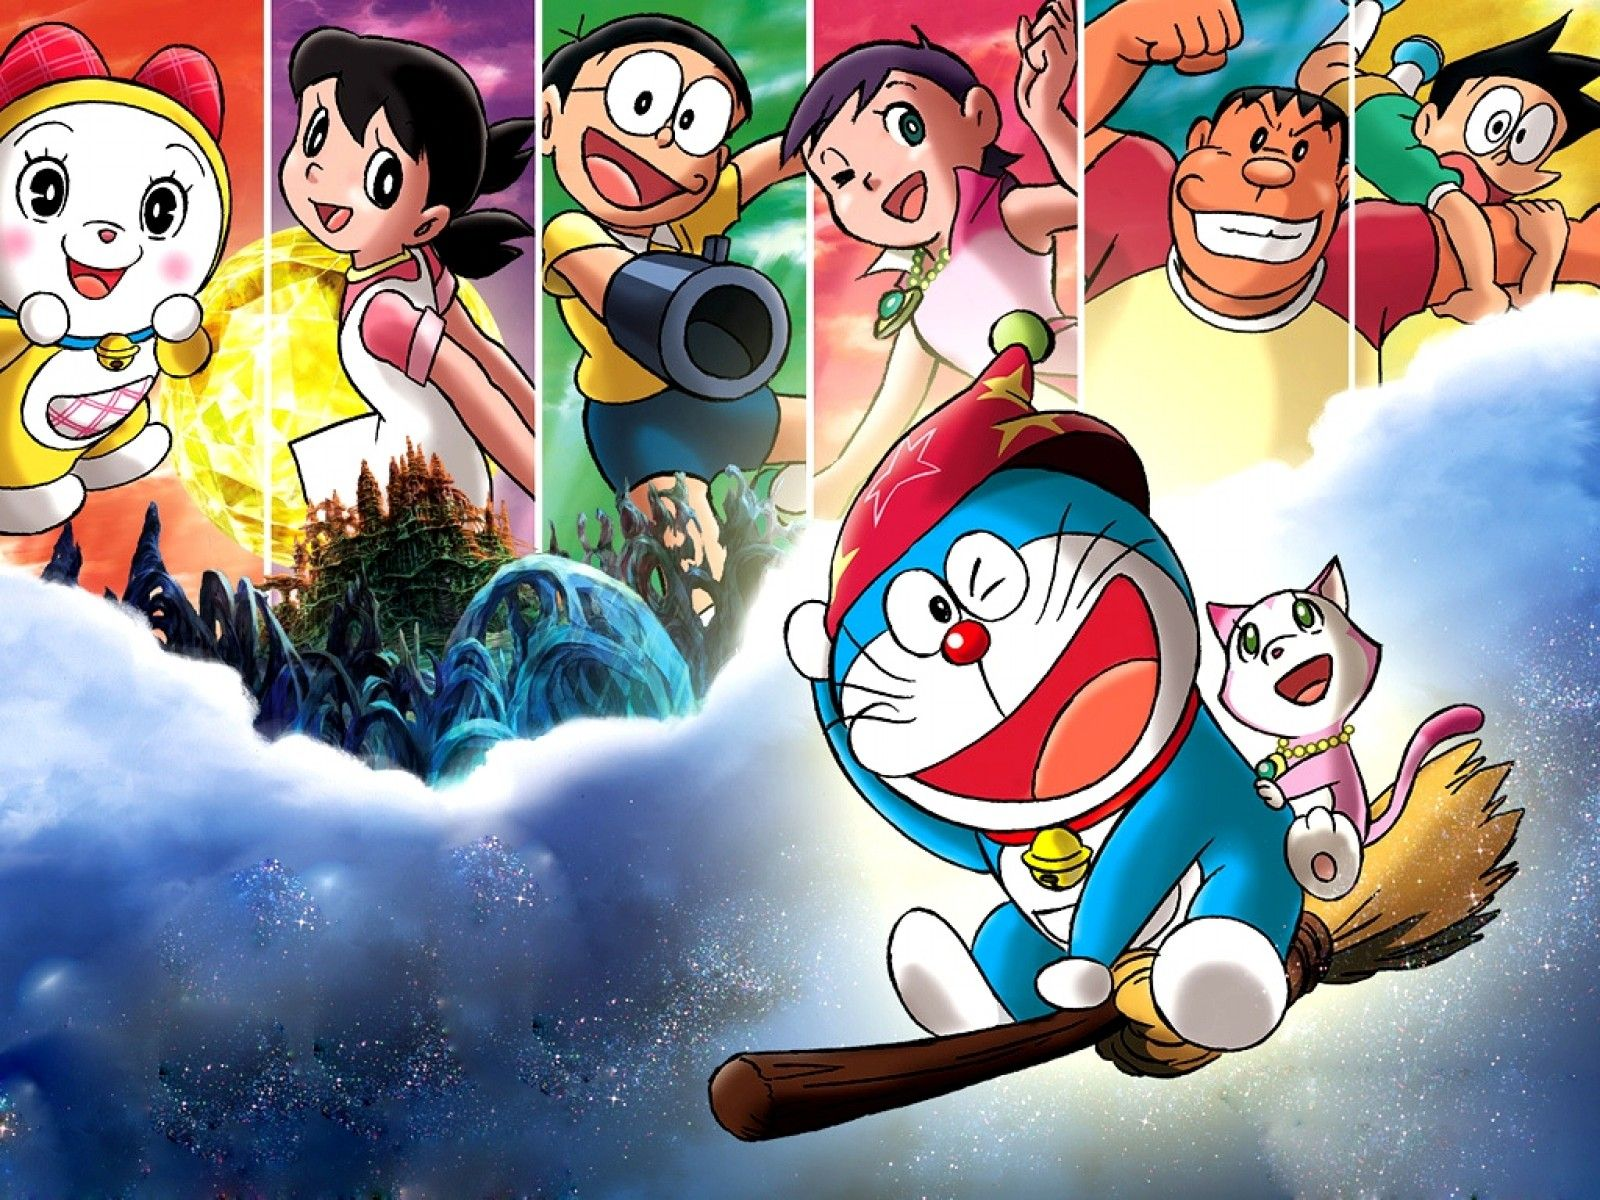 Download wallpaper doraemon free - Doraemon And Friends Wallpapers Hd Doraemon Pinterest Friends Wallpaper Hd